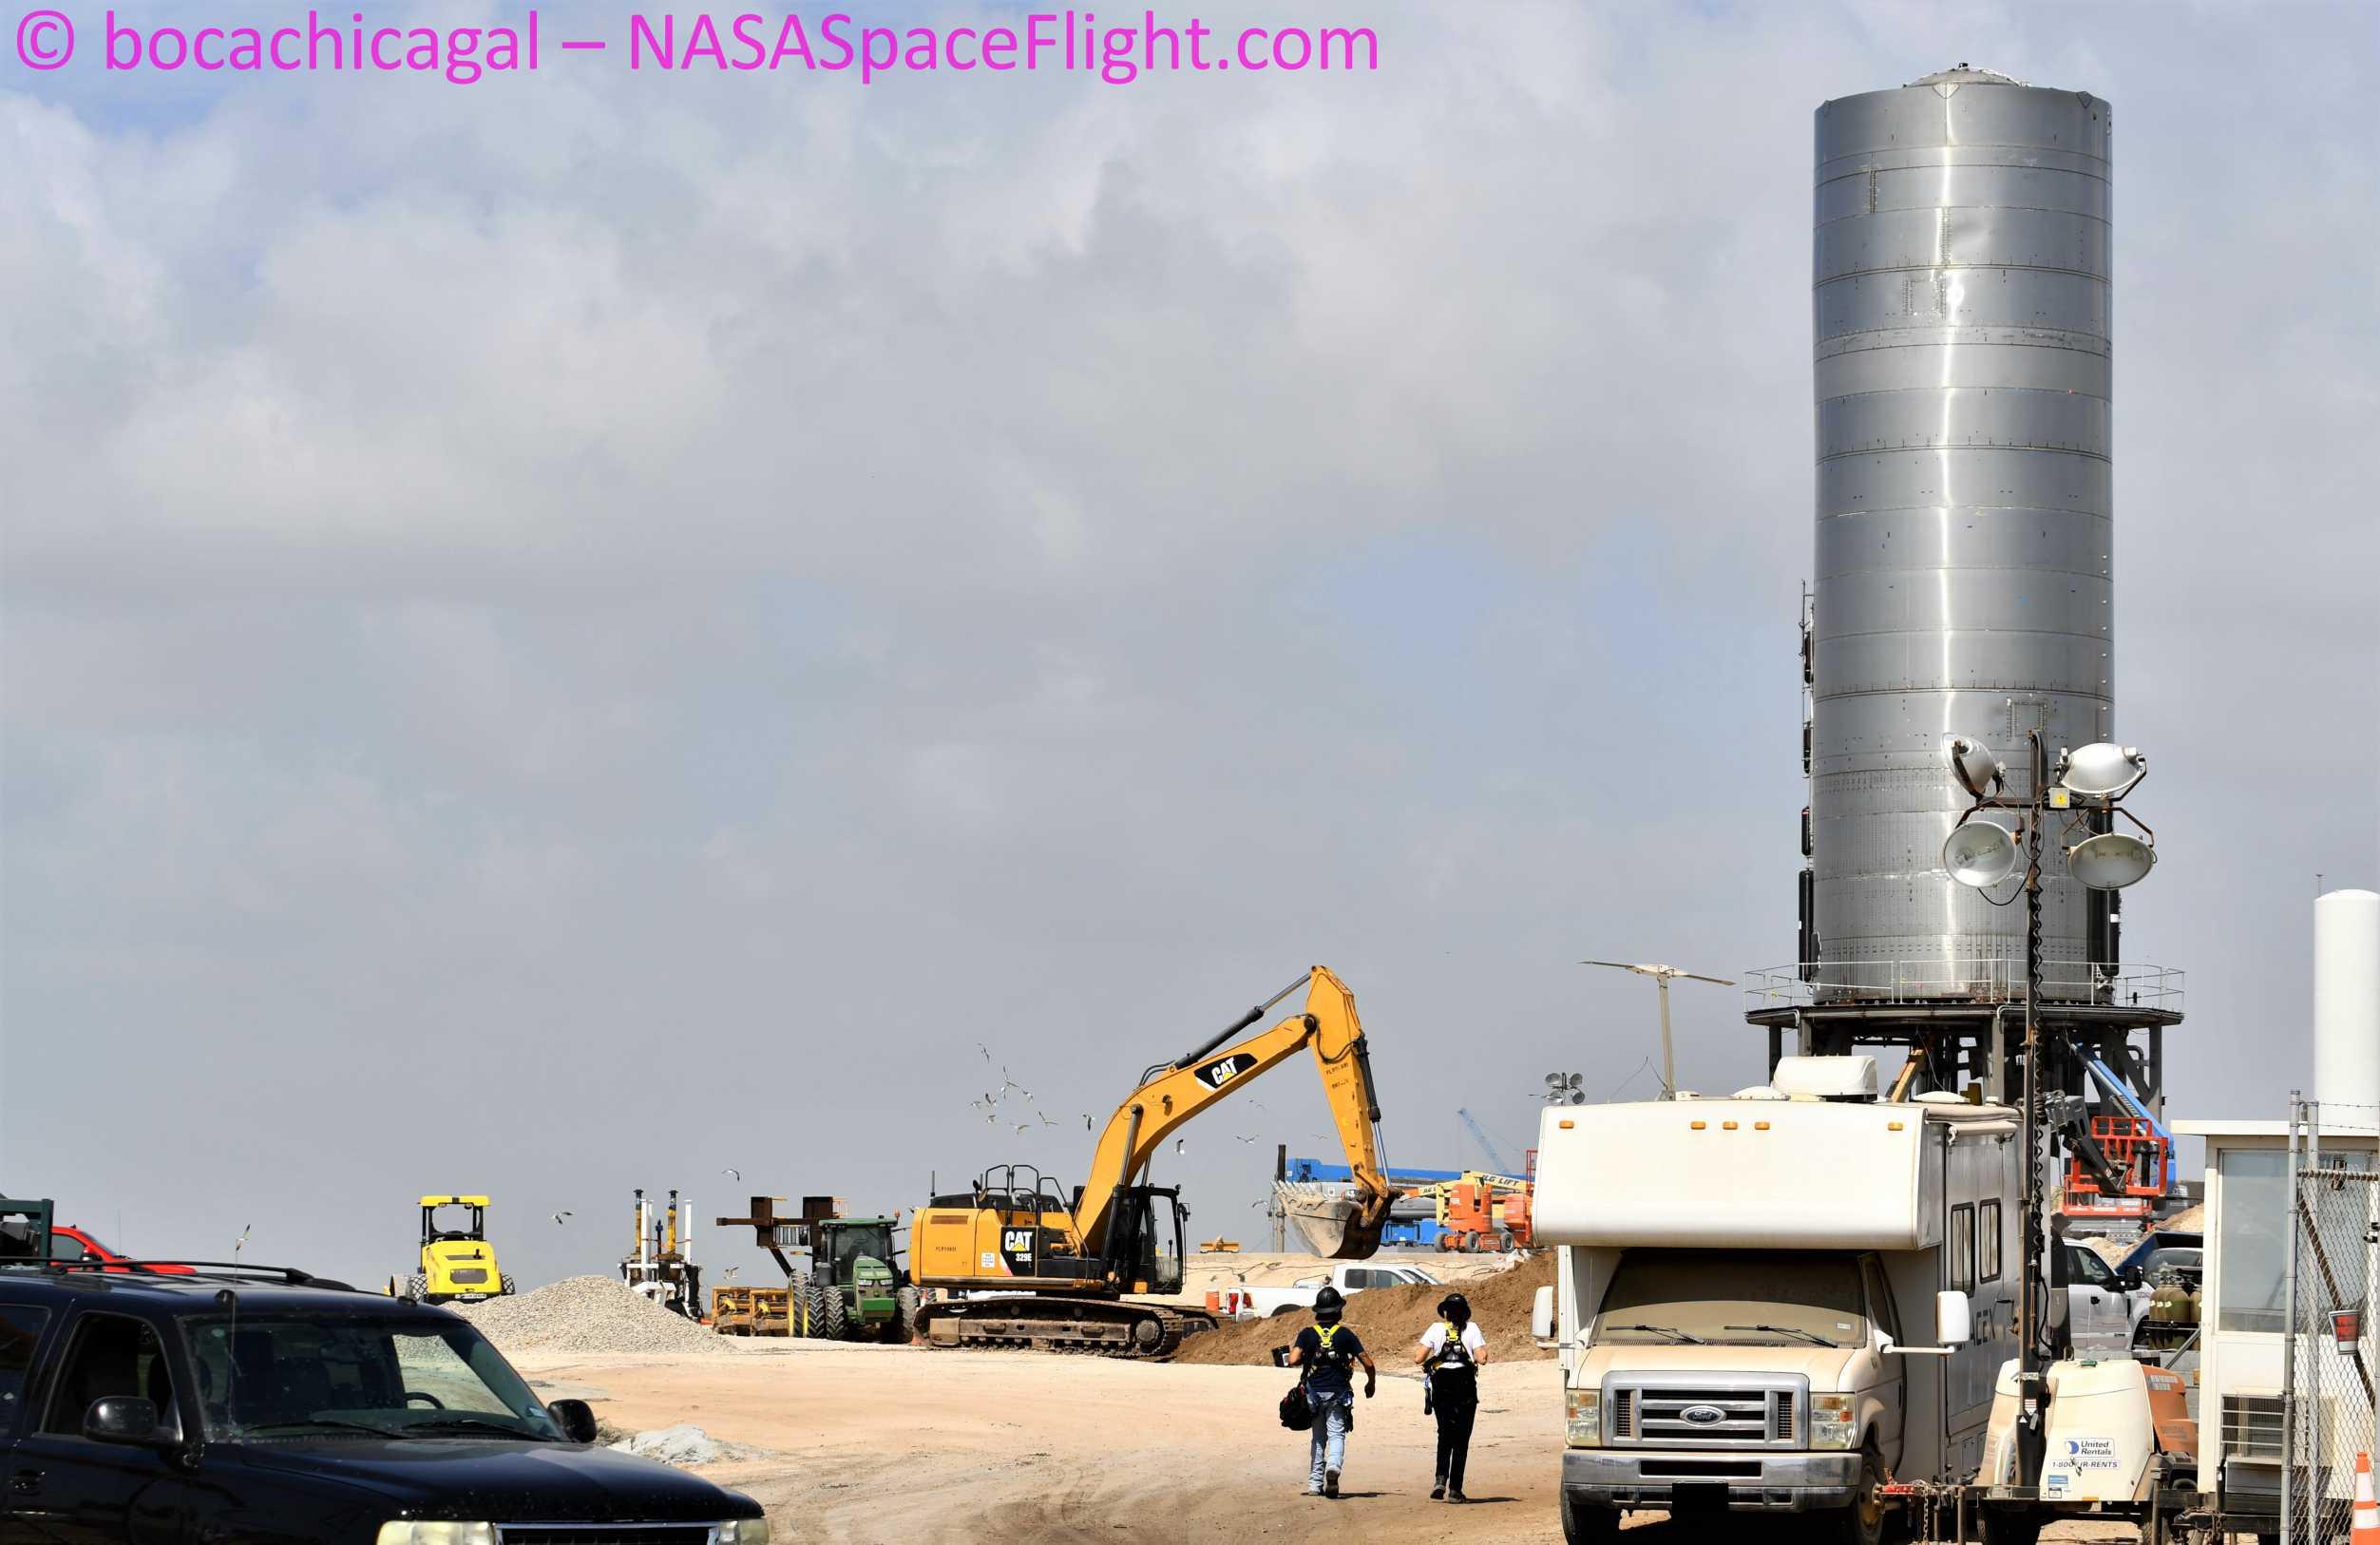 Starship Boca Chica 070720 (NASASpaceflight – bocachicagal) SN5 pad work 3 (c)